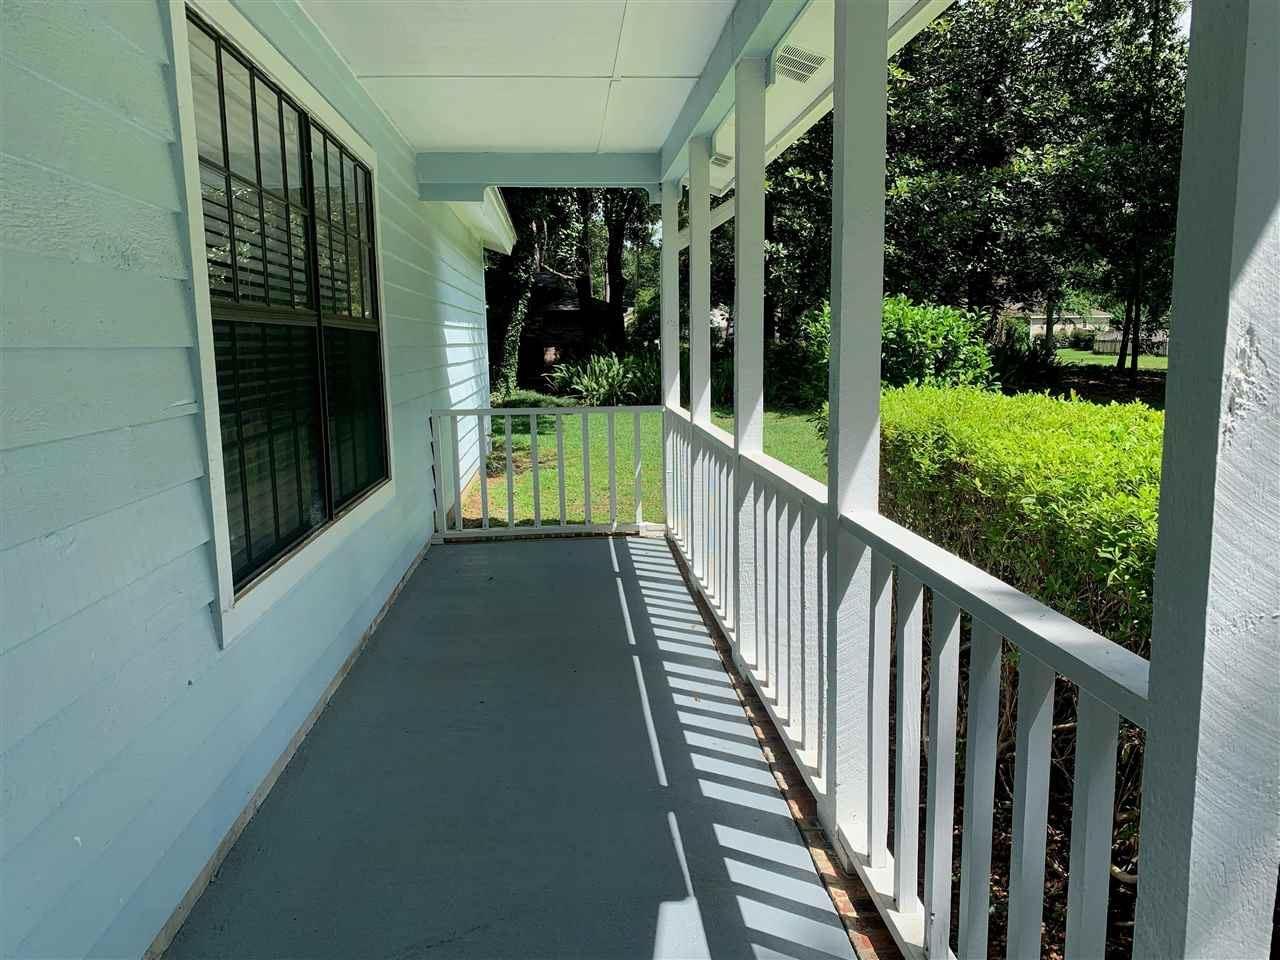 Photo of 3217 Whirlaway Trail, TALLAHASSEE, FL 32309 (MLS # 331901)